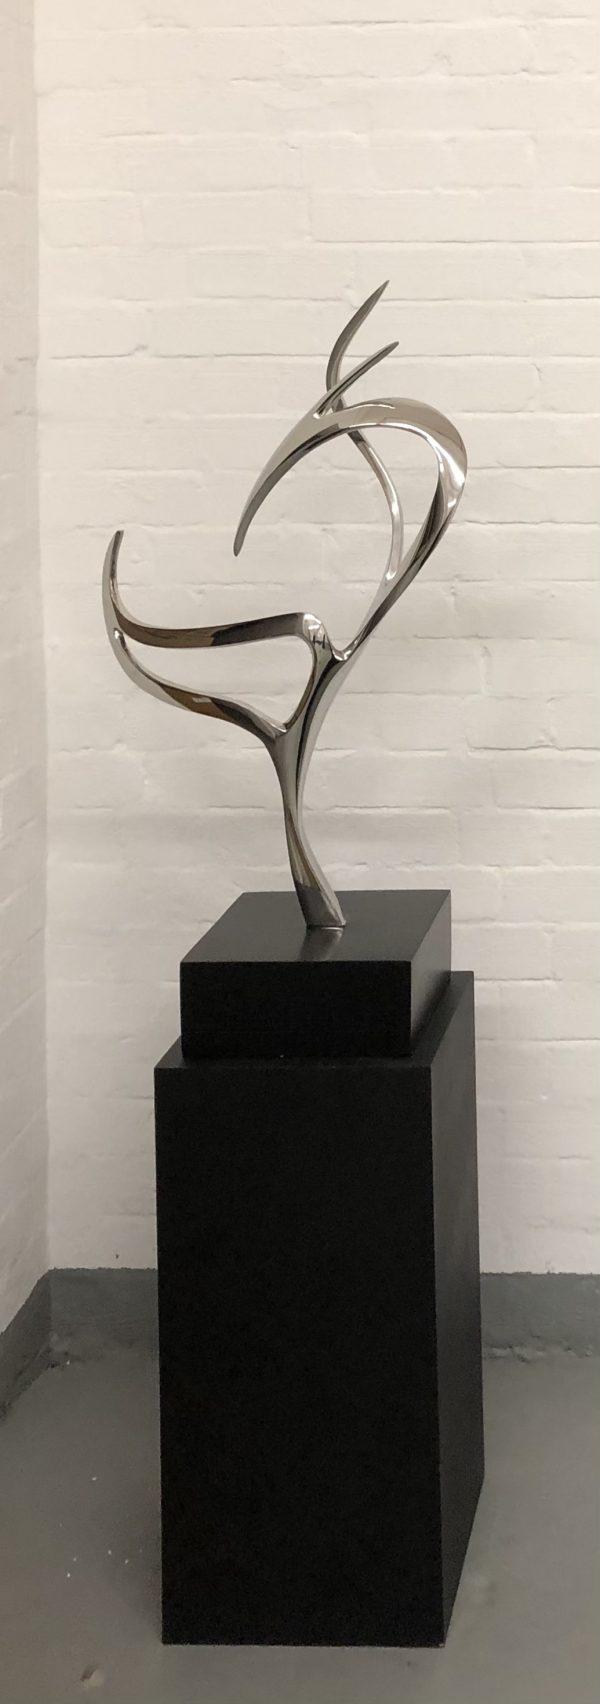 Masoud Akhavanjam 2 - Janet Rady Fine Art